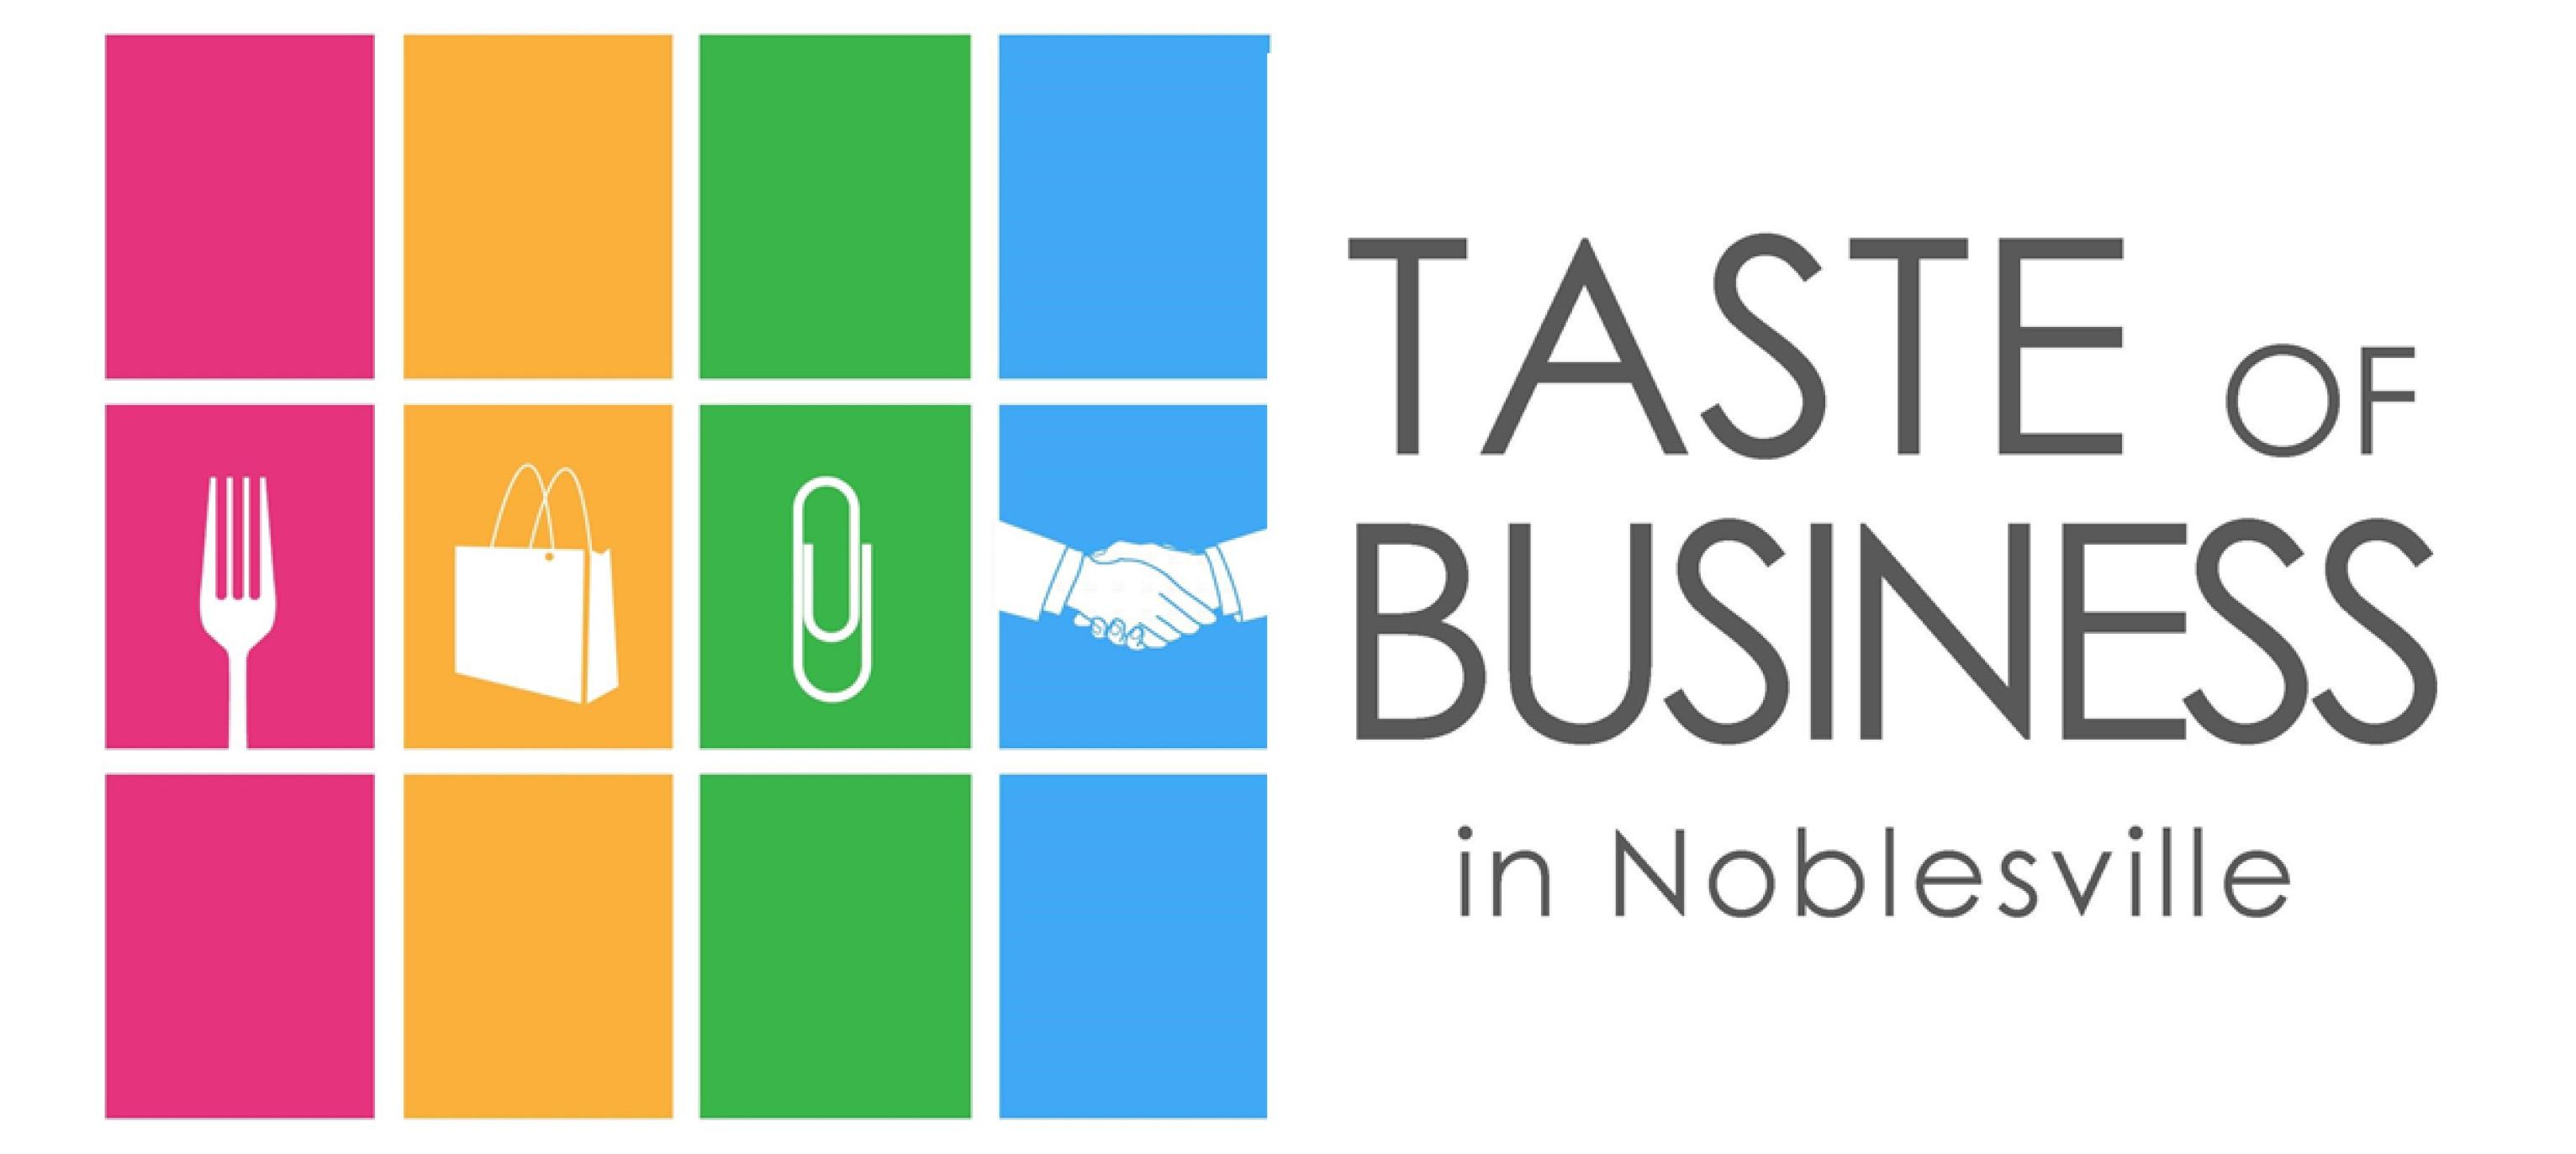 Taste of Business